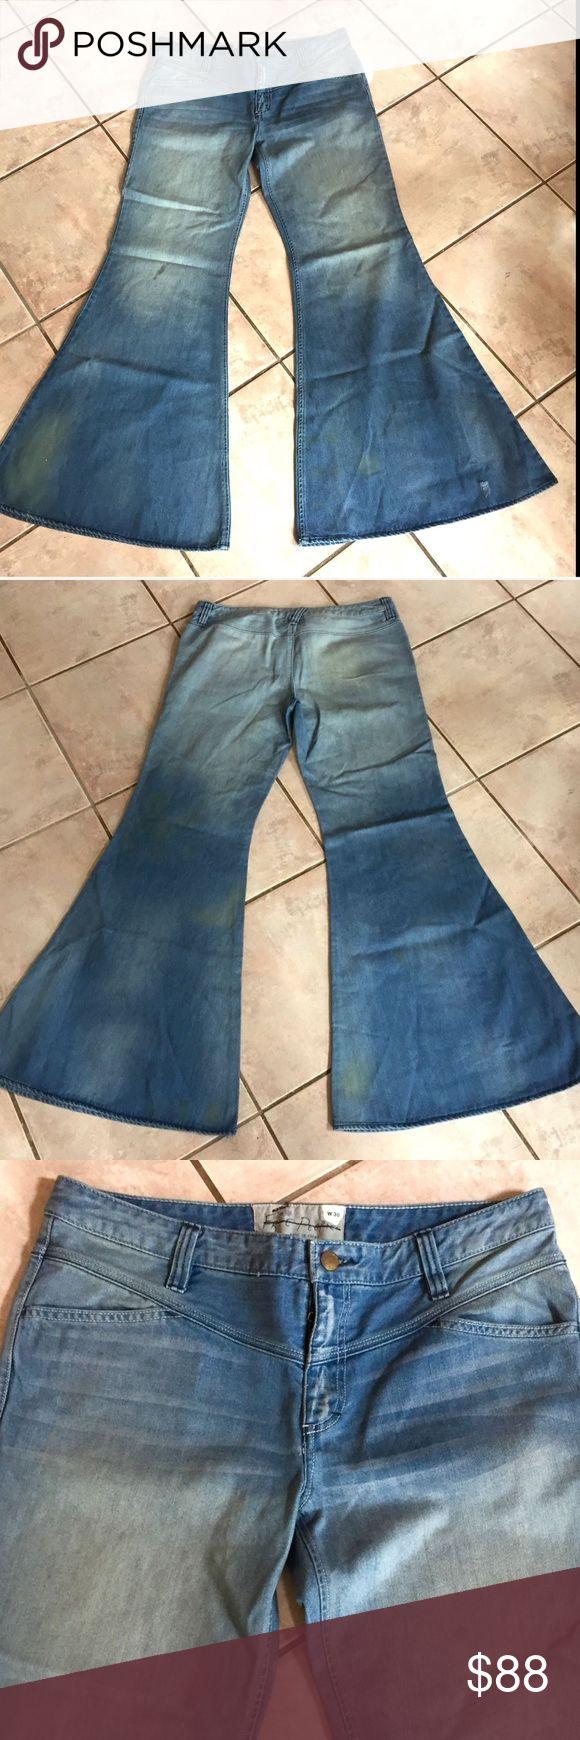 Selling this Free People Distress Relax Leg Super Flare Jean 30 on Poshmark! My username is: richbororiches. #shopmycloset #poshmark #fashion #shopping #style #forsale #Free People #Denim